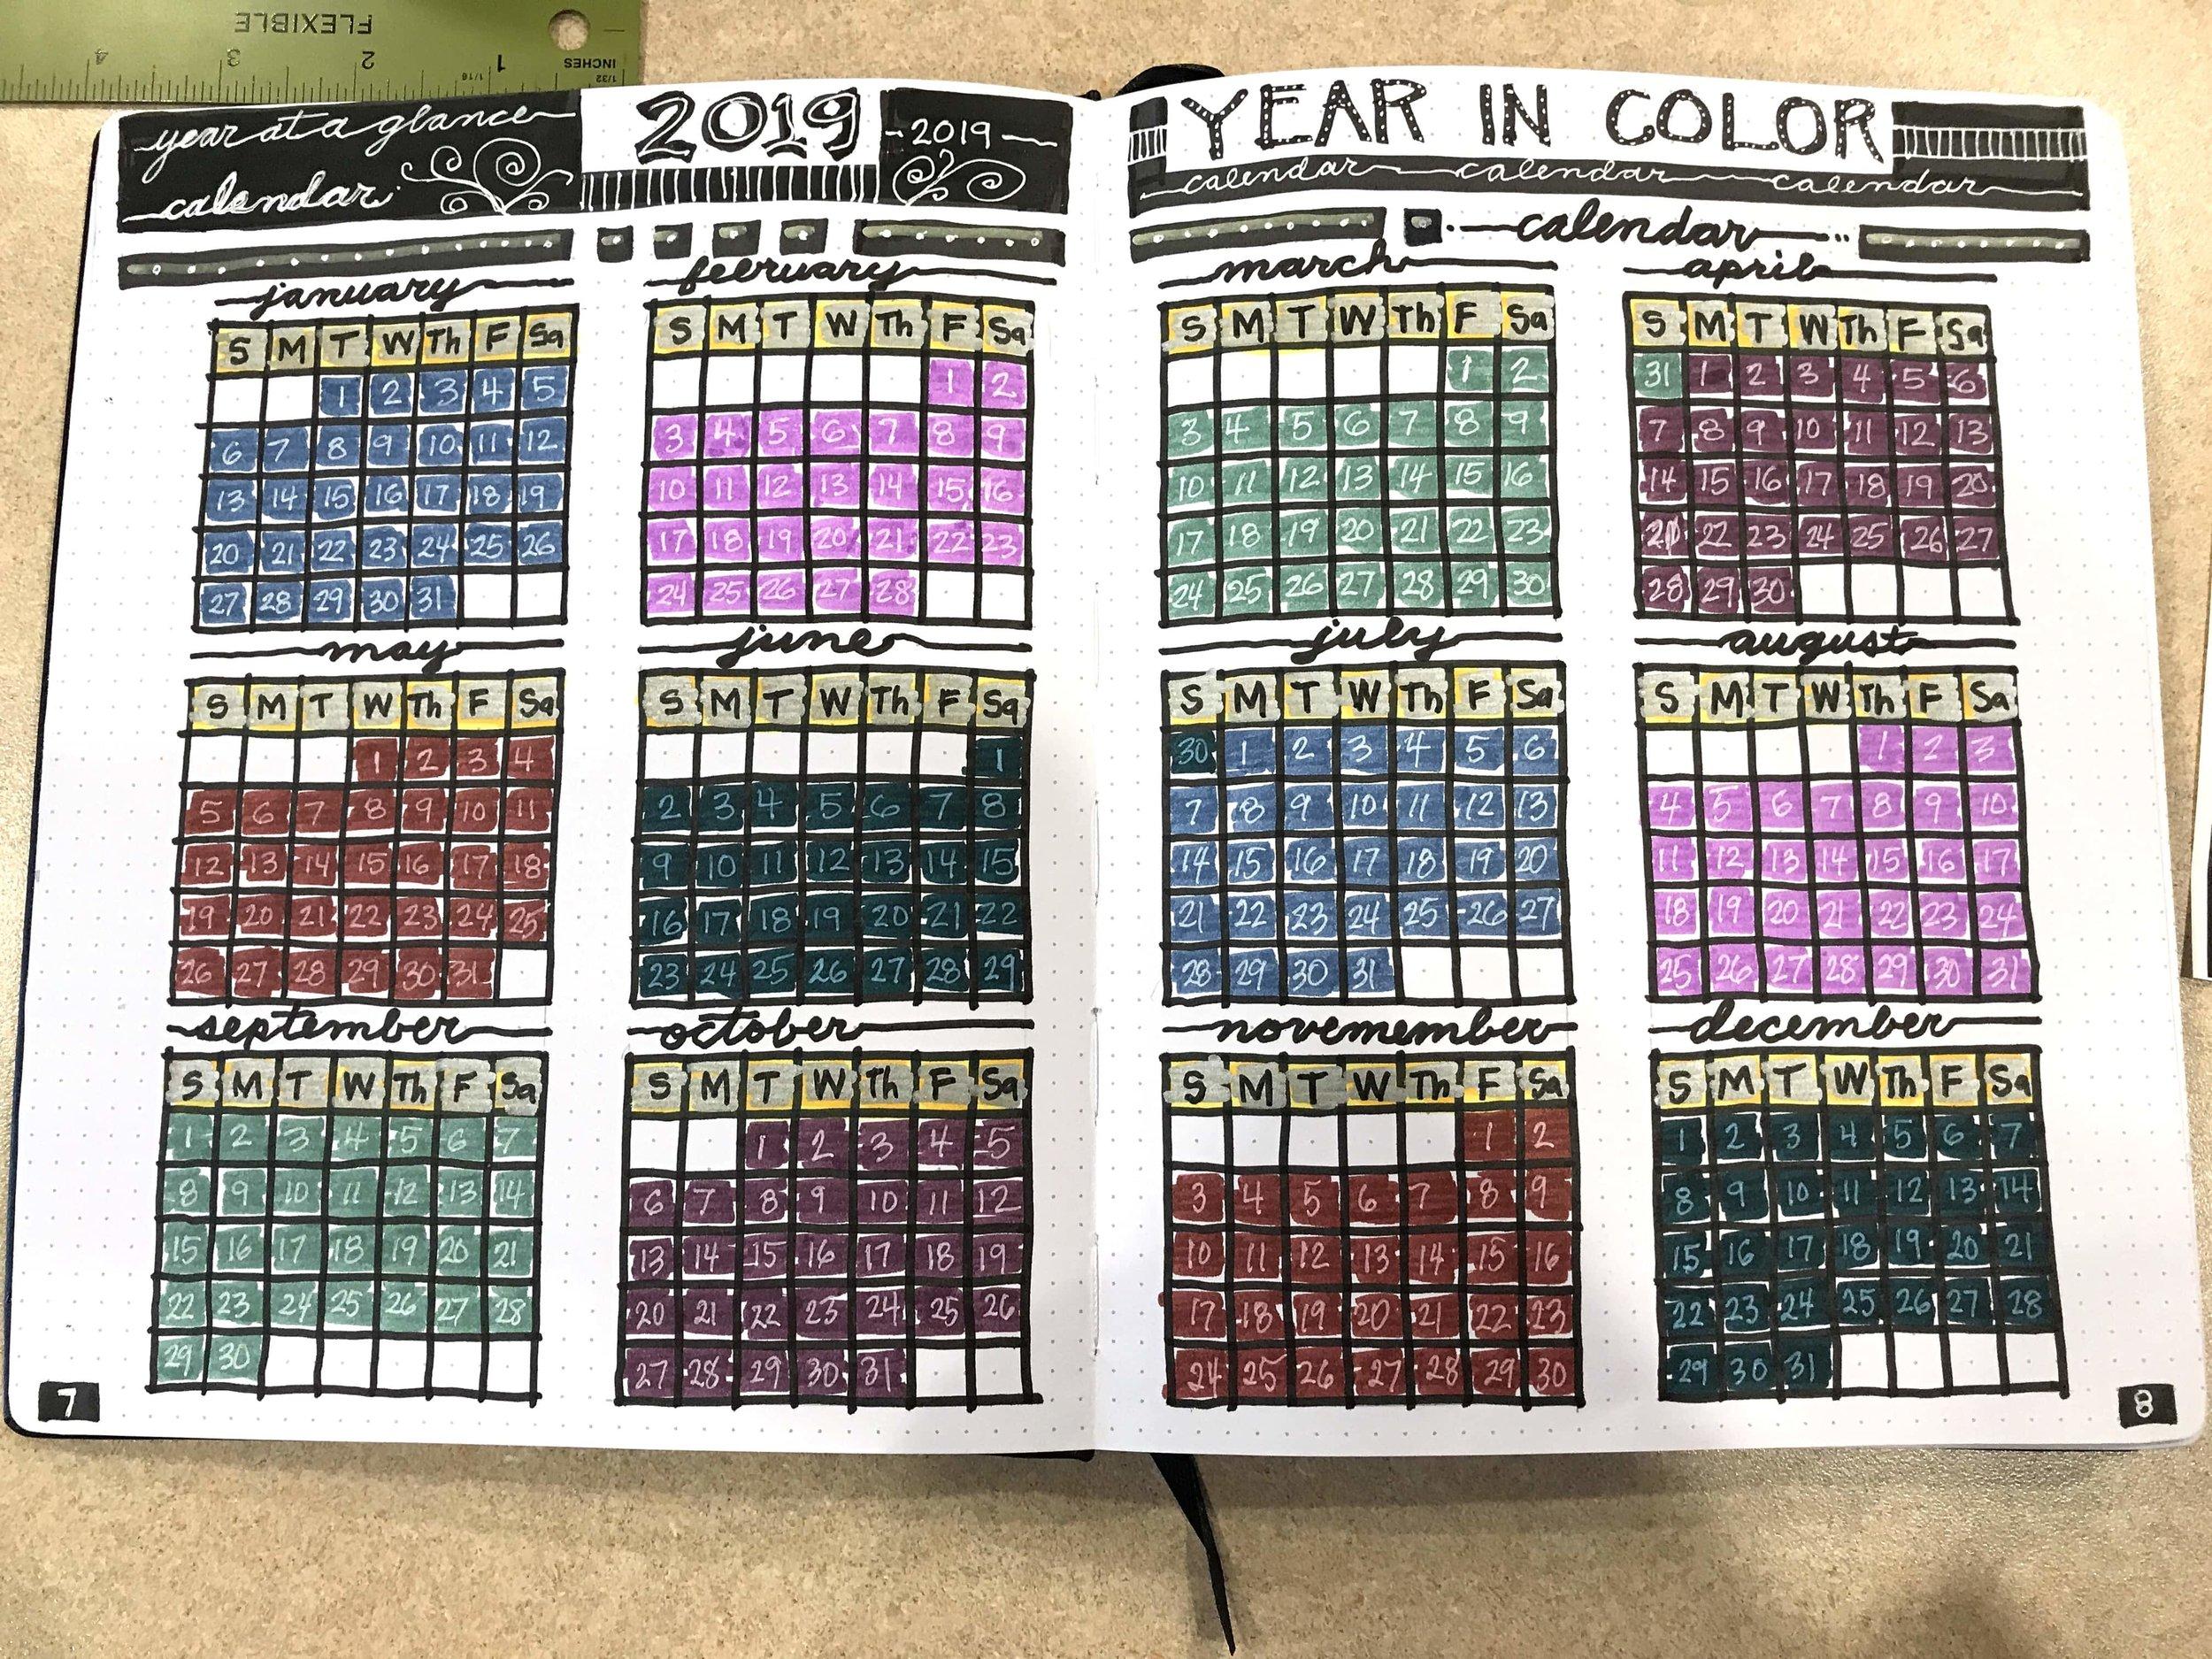 2019 Bullet Journal Year spread months Patricia Tiffany Morris bujo.jpg